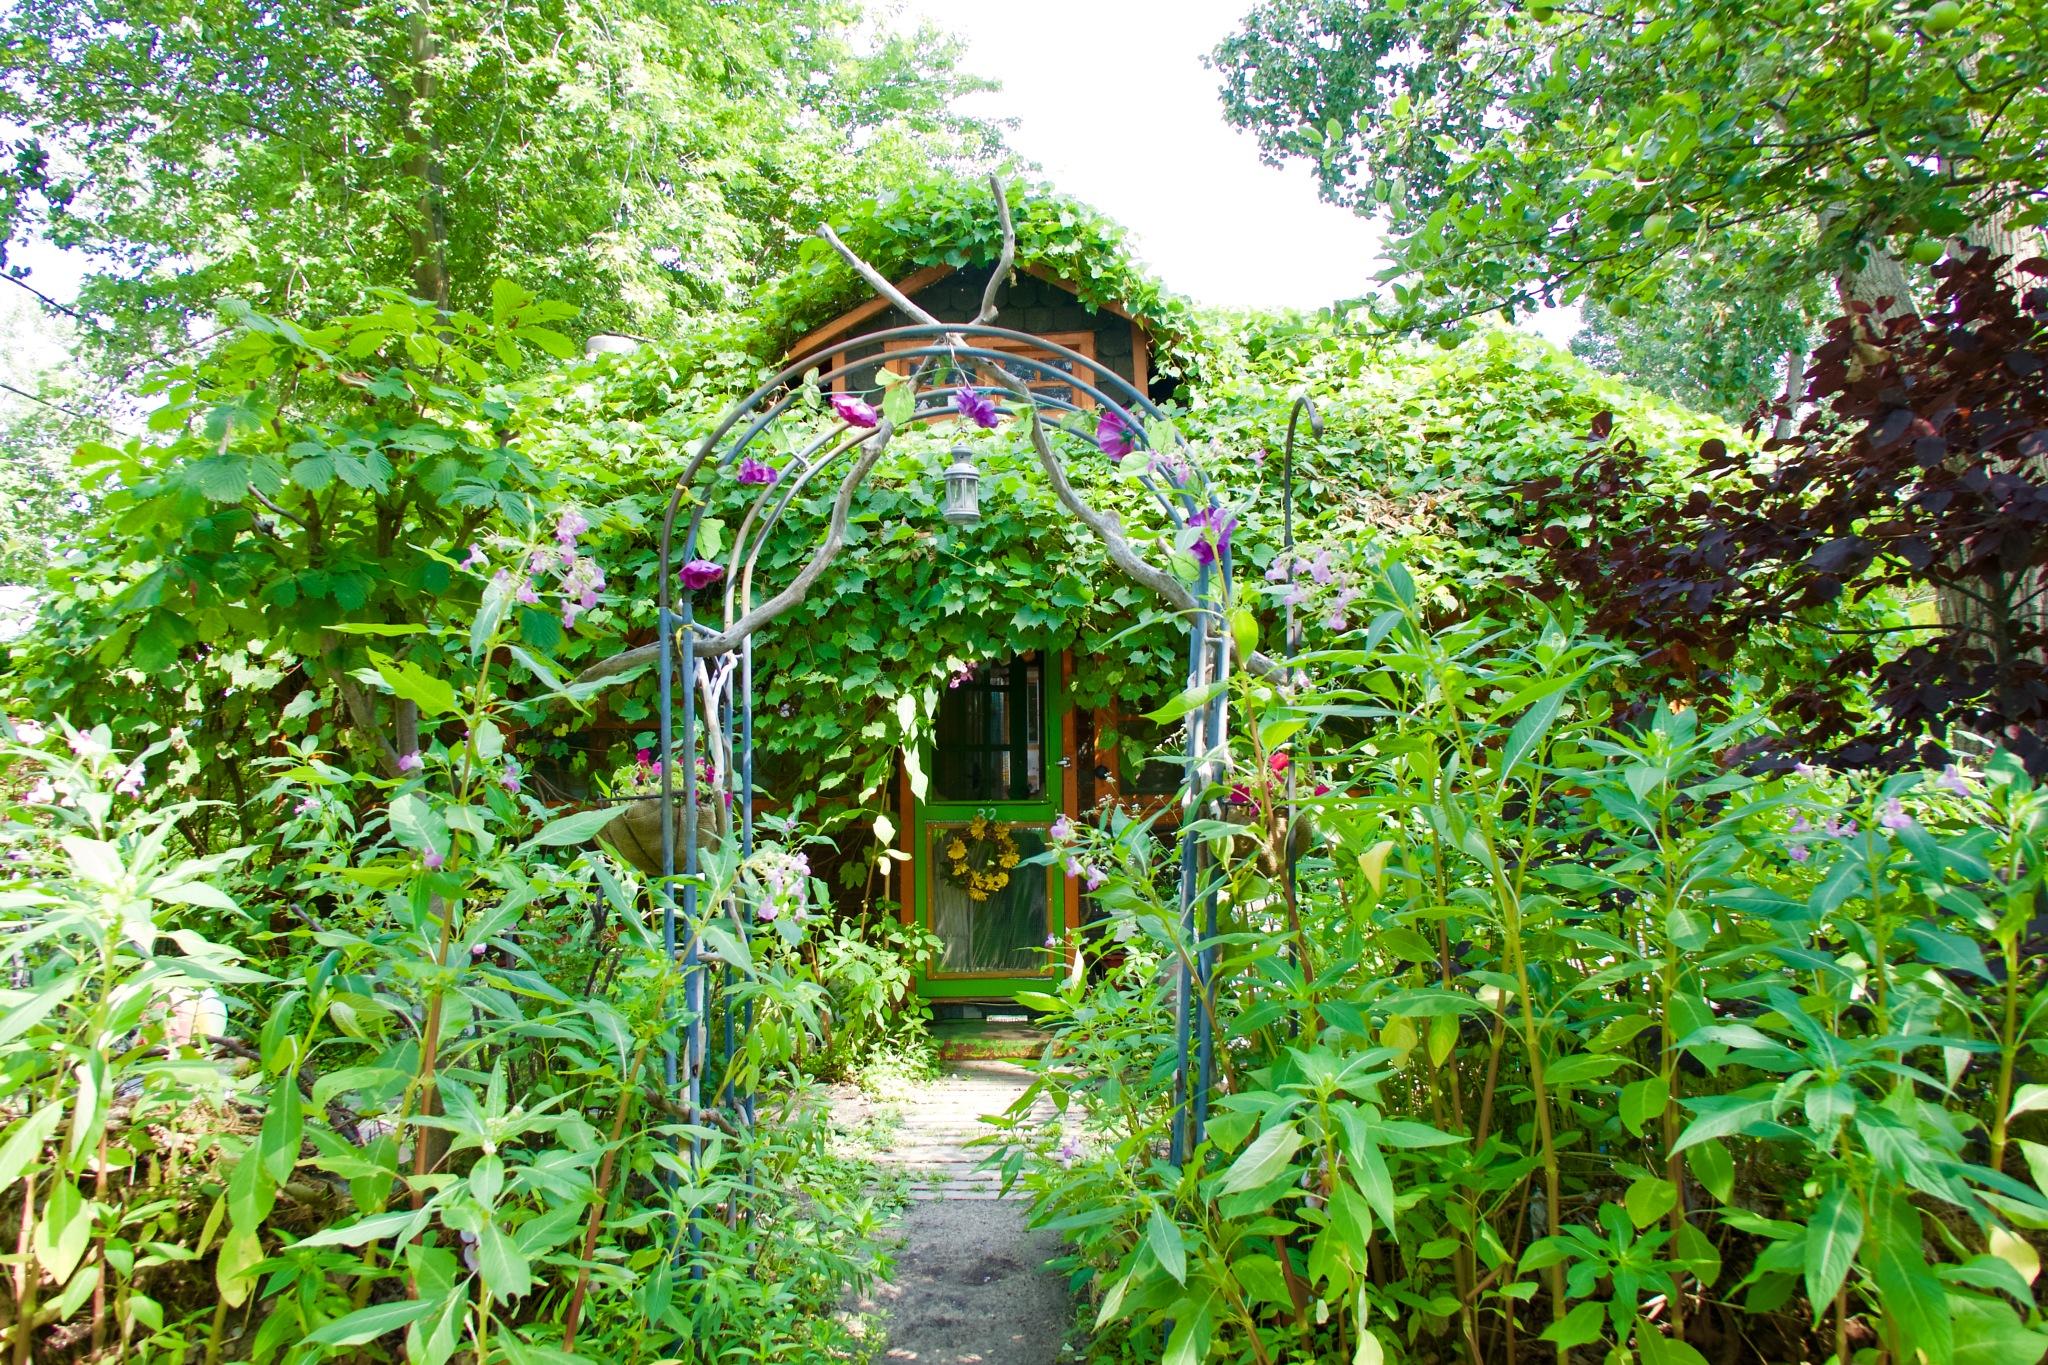 Magic Island Garden by Karen Bekker